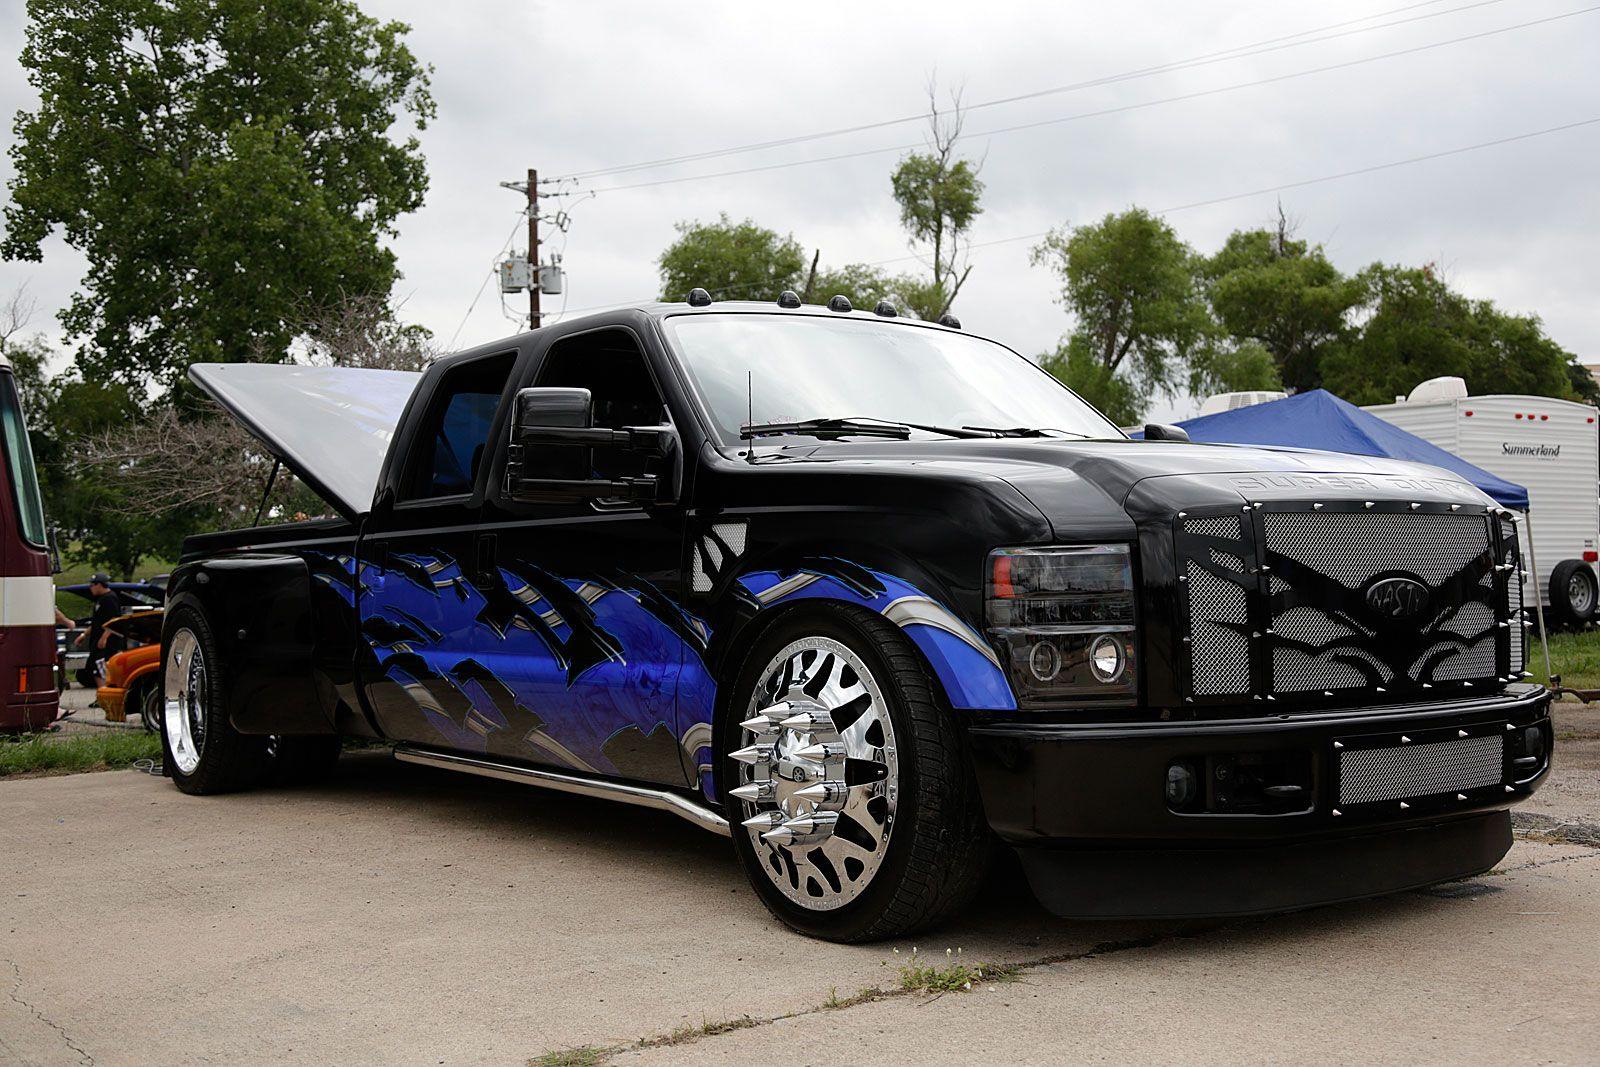 Lifted chevy show trucks 2103 texas heatwave truck show - 2103 Texas Heatwave Truck Show 73 Lifted Chevy Dually Photo 68